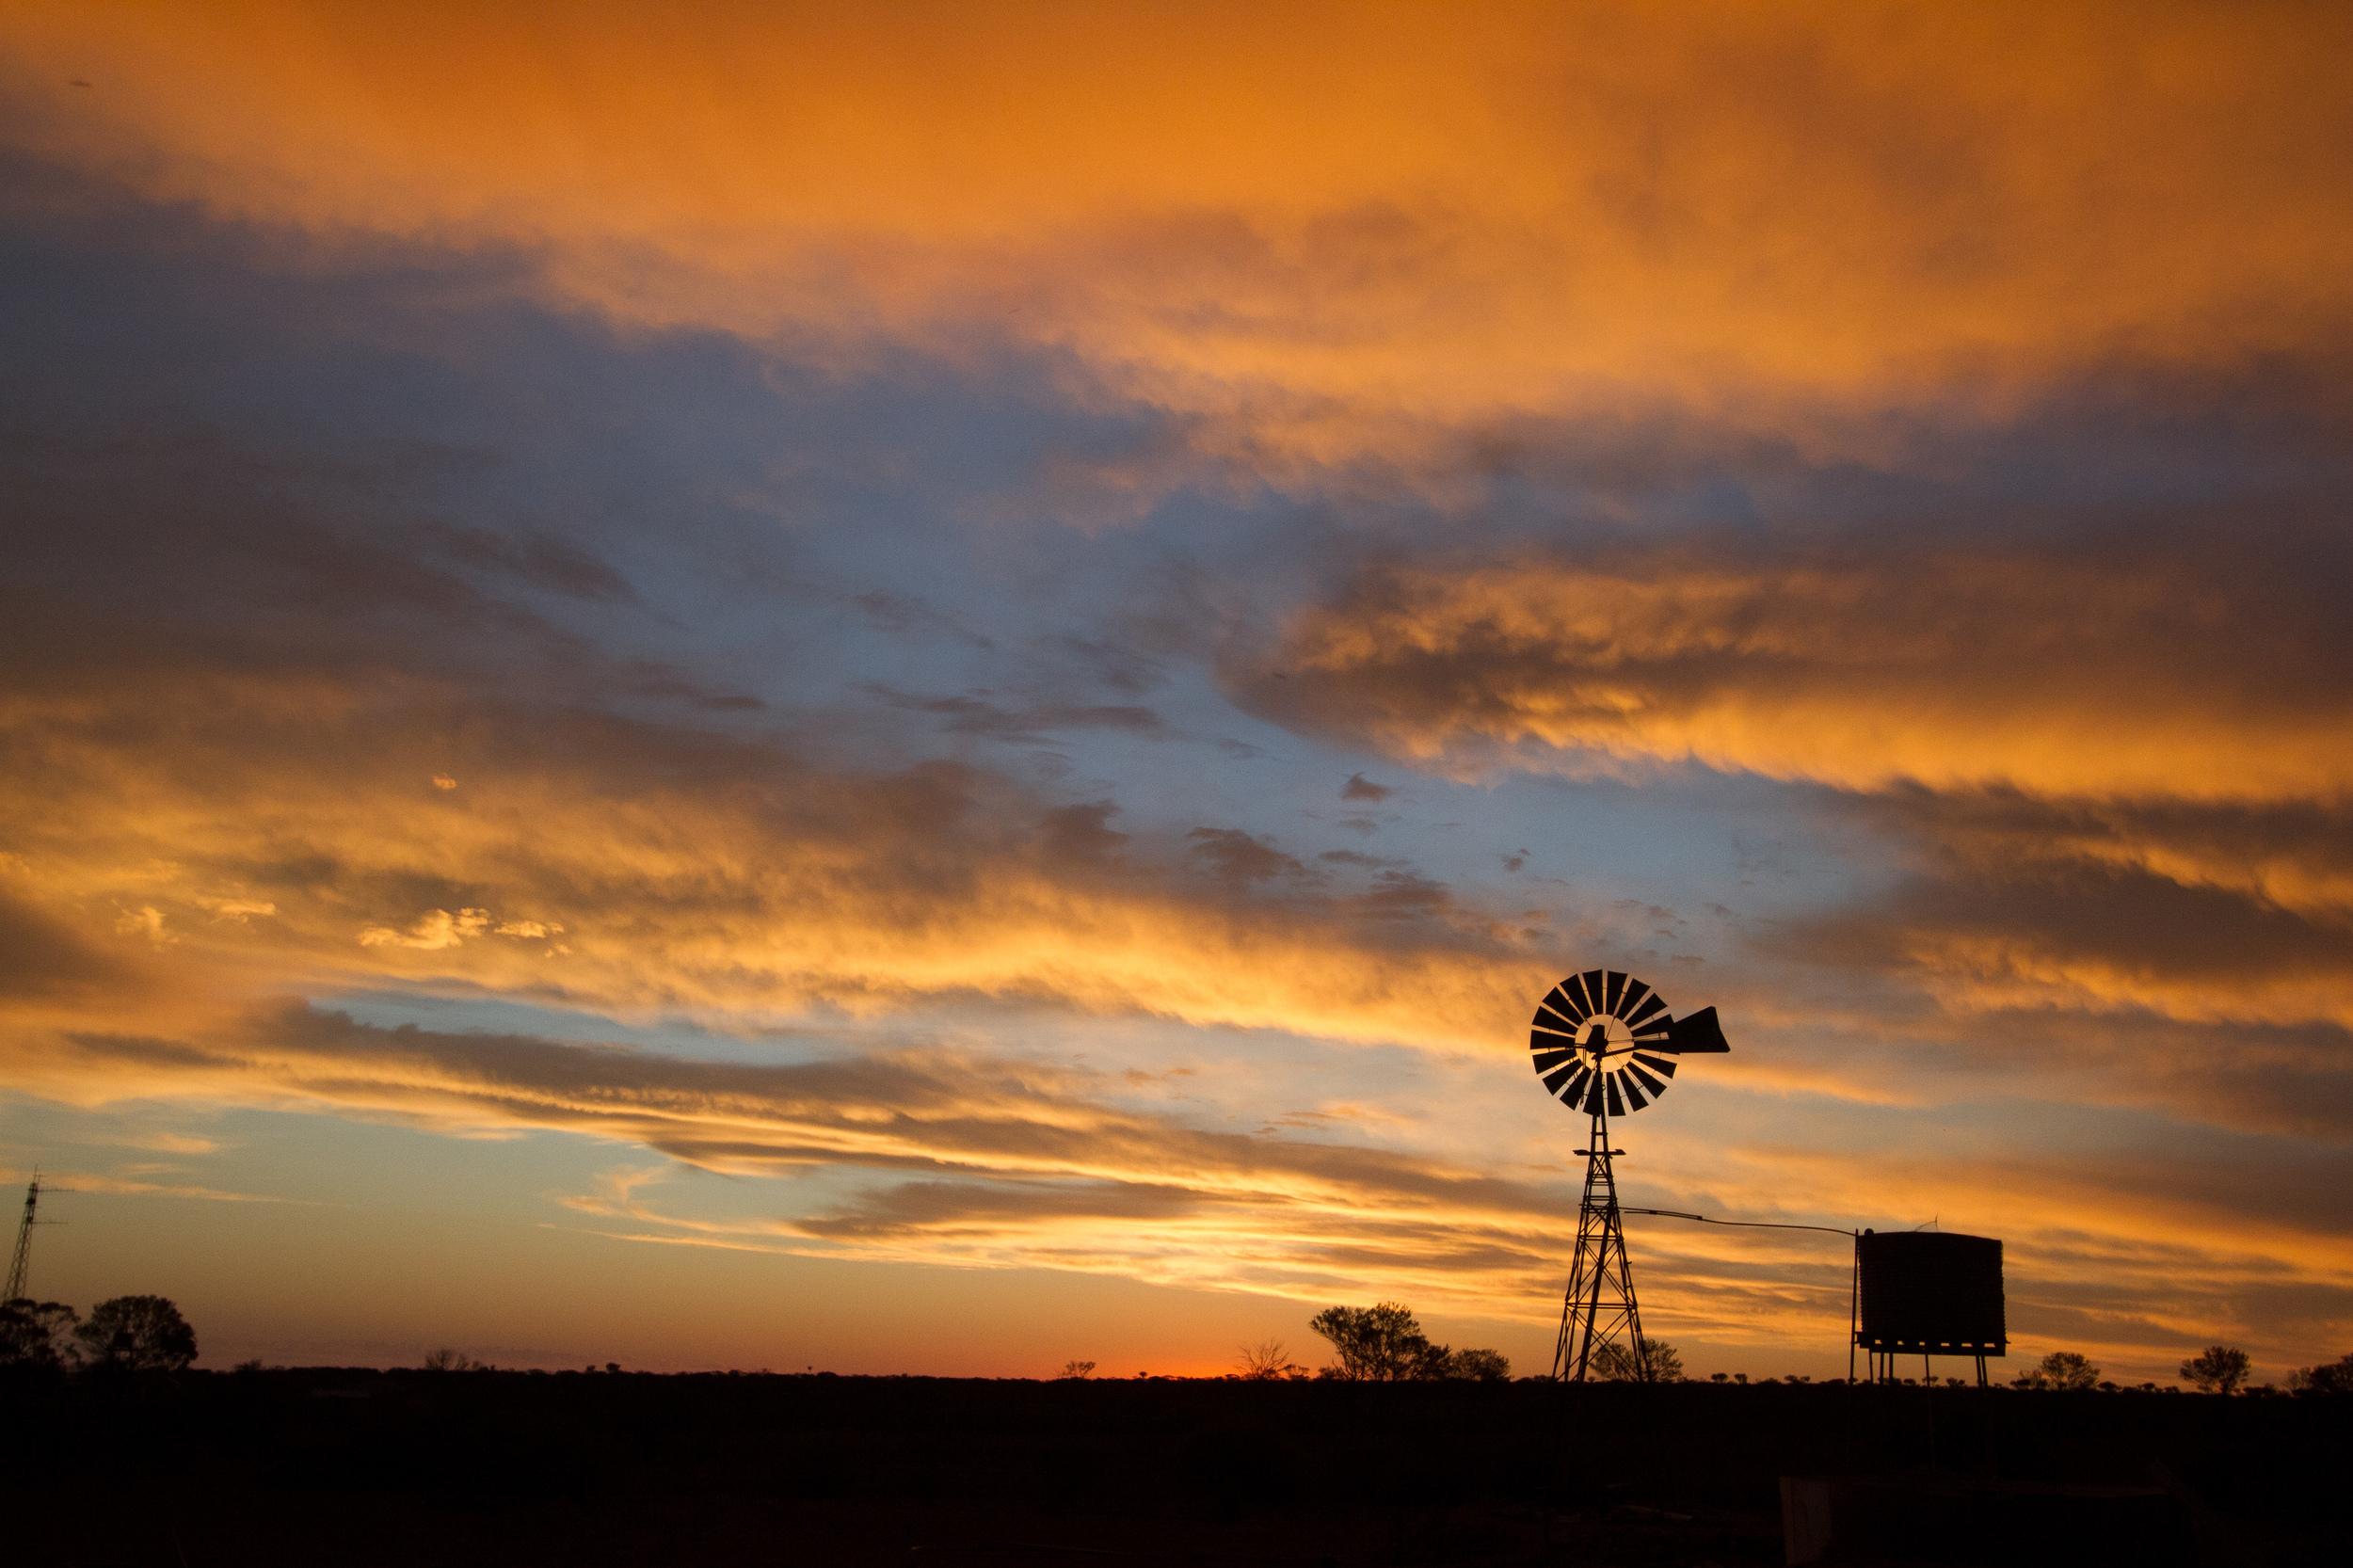 Sunset over Kokatha Station, South Australia, 2012. Photo by Angus Kennedy.